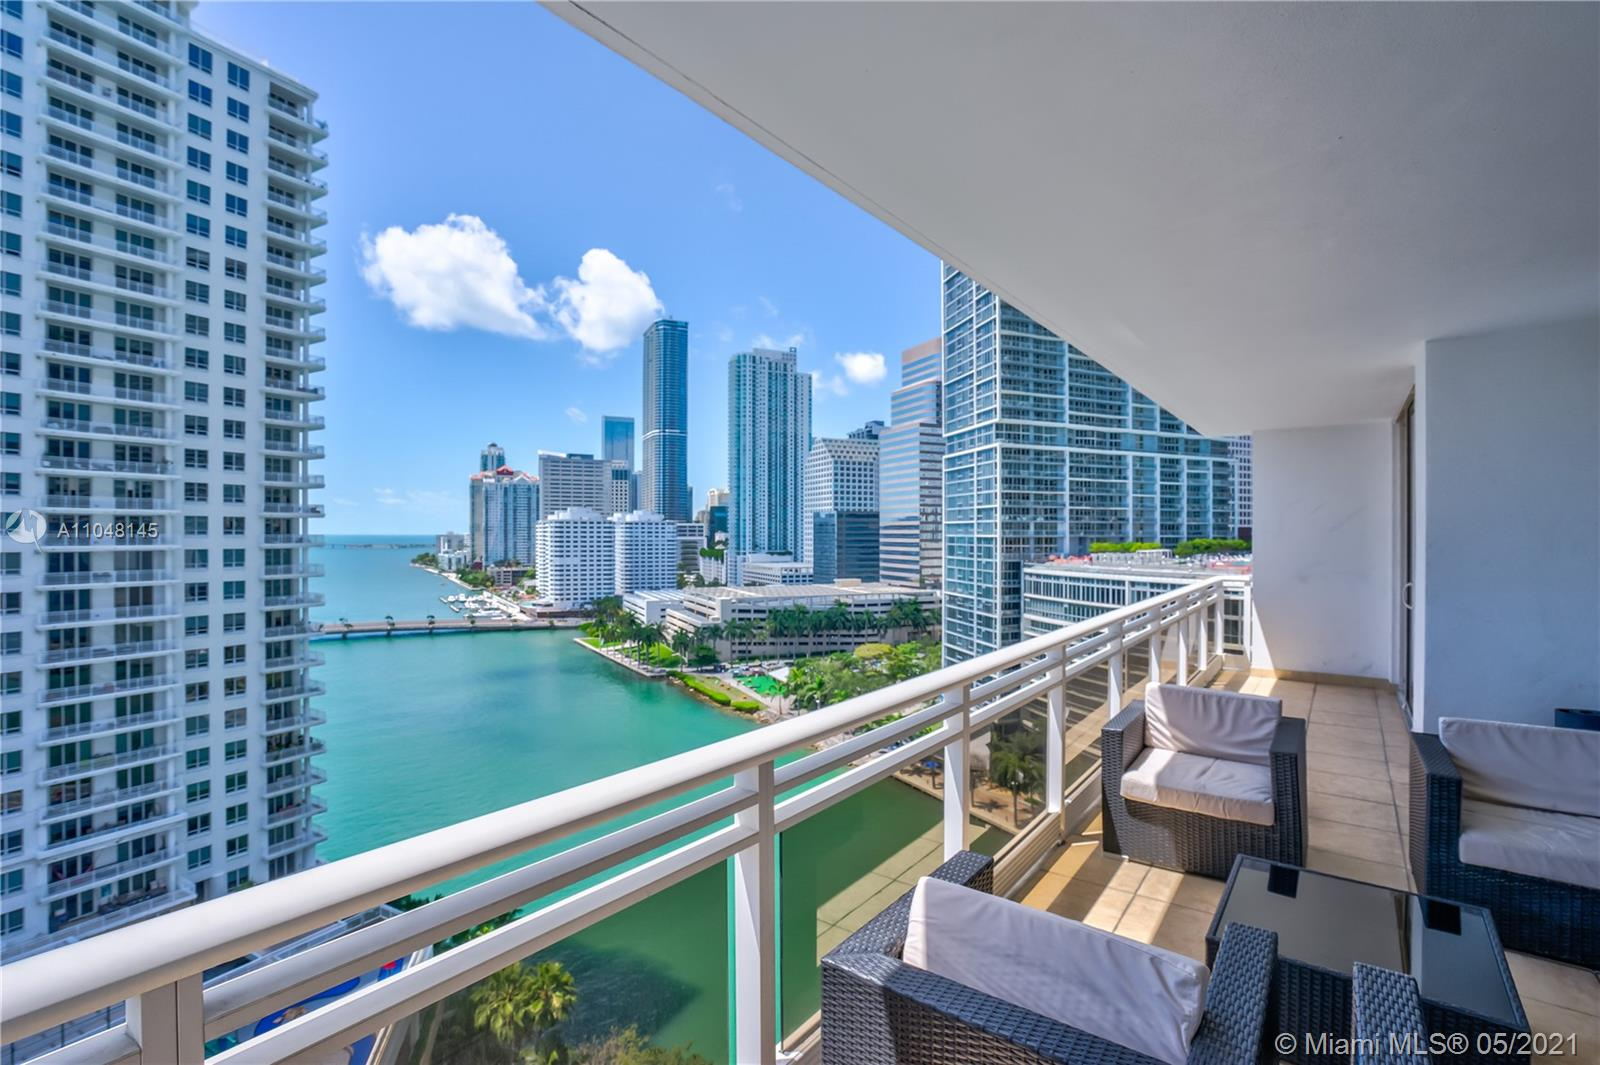 Carbonell #1703 - 901 Brickell Key Blvd #1703, Miami, FL 33131